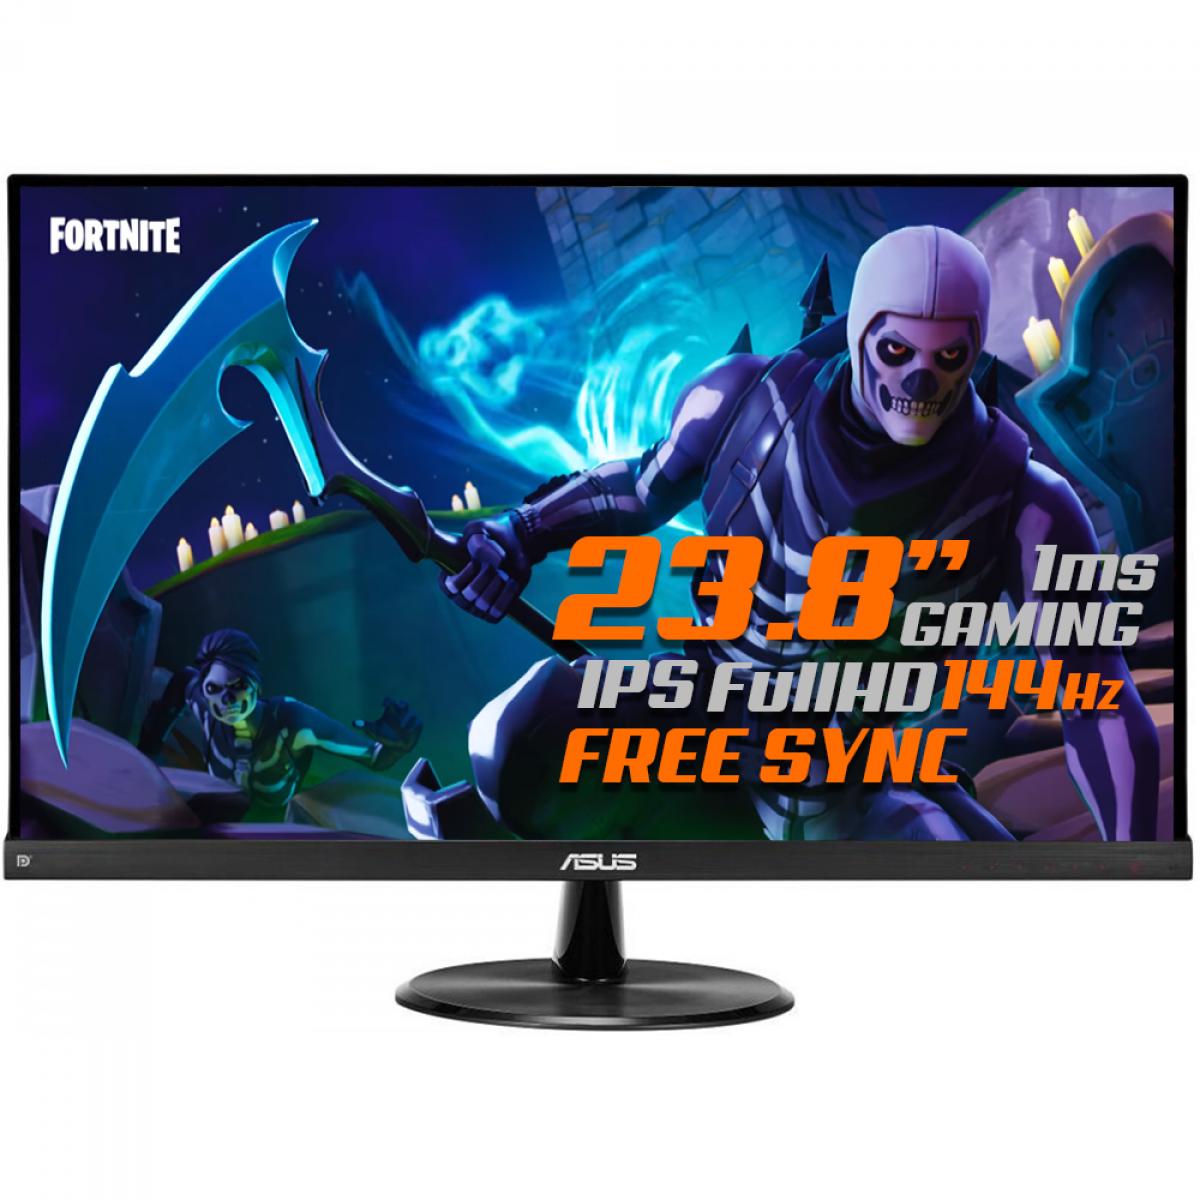 Monitor Gamer Asus 23,8 Pol, Full HD, Widescreen, 144Hz, 1ms, IPS, HDMI, DisplayPort, FreeSync Premium, VP249QGR